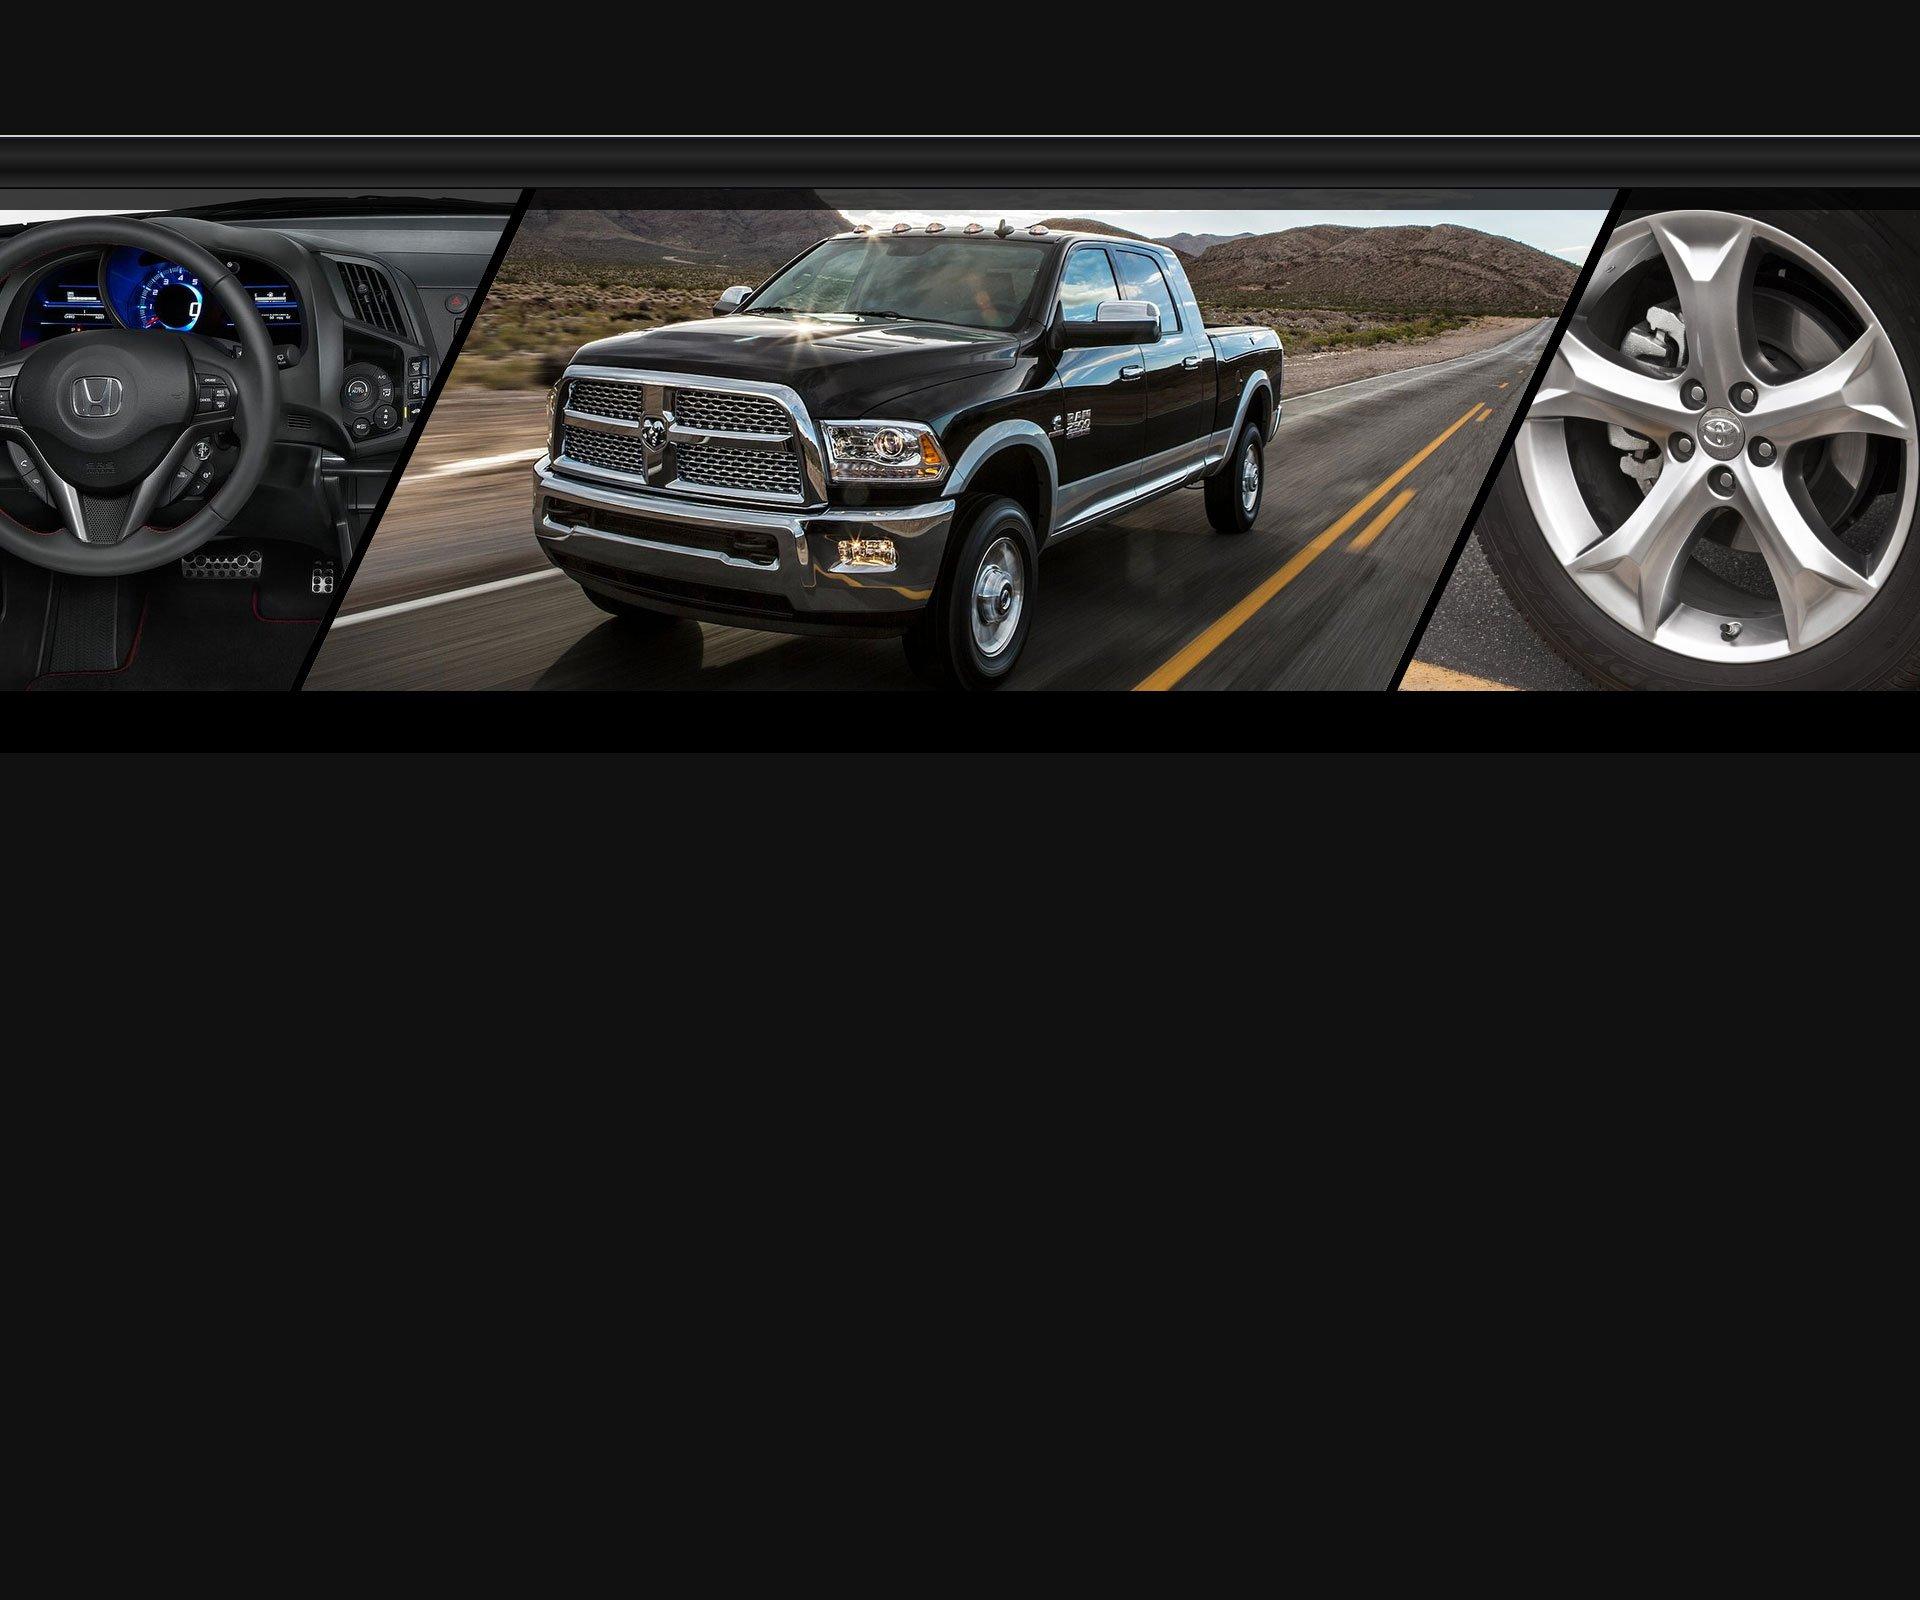 Chevrolet Dealerships In Va: Warrenton VA Dealer